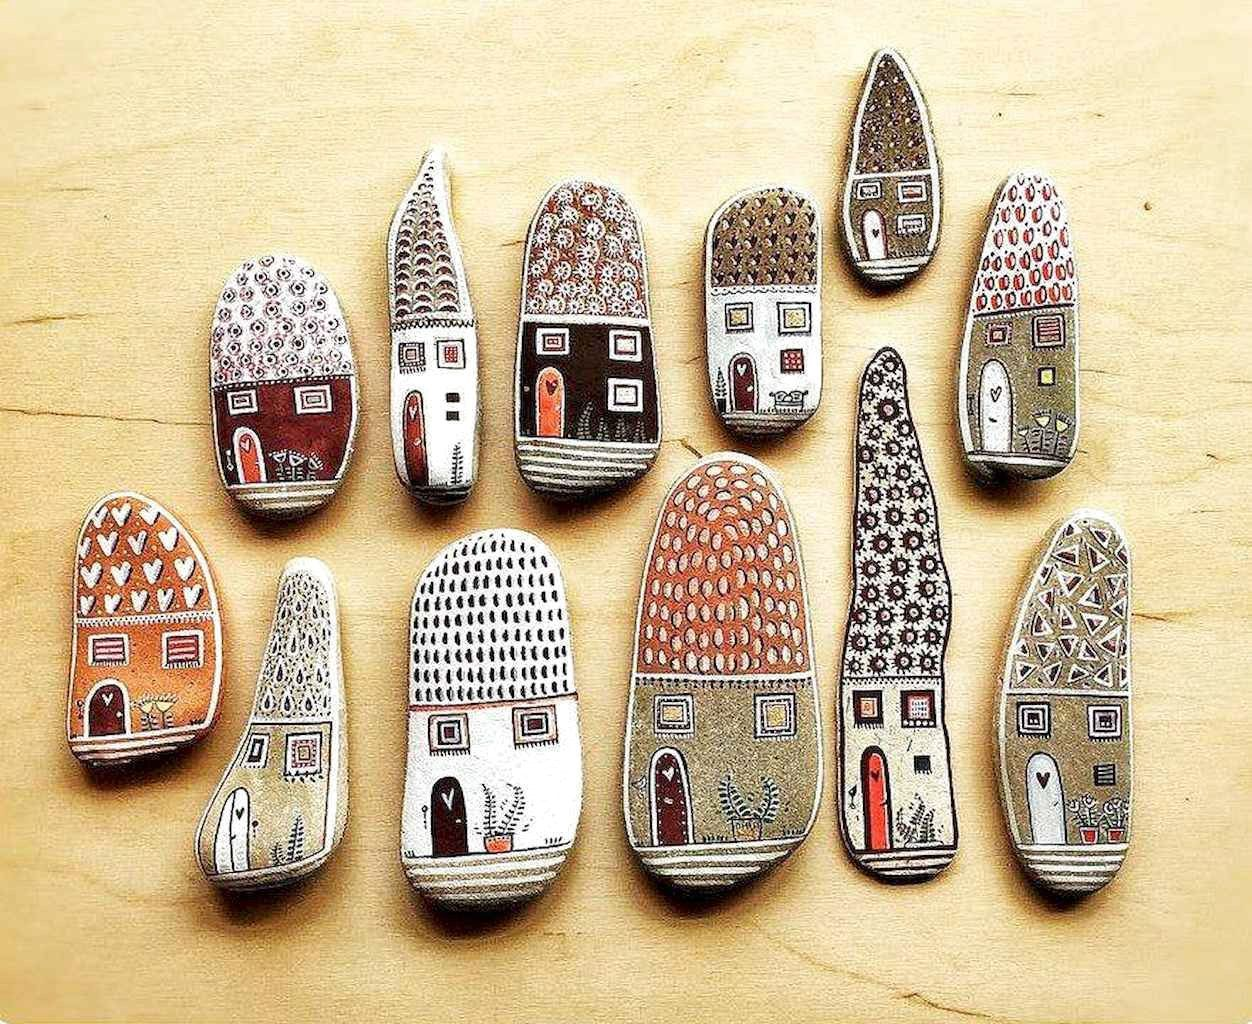 50 Favourite Diy Painted Rock Ideas for Your Home Decoration #FavouriteDiyPaintedRockIdeas